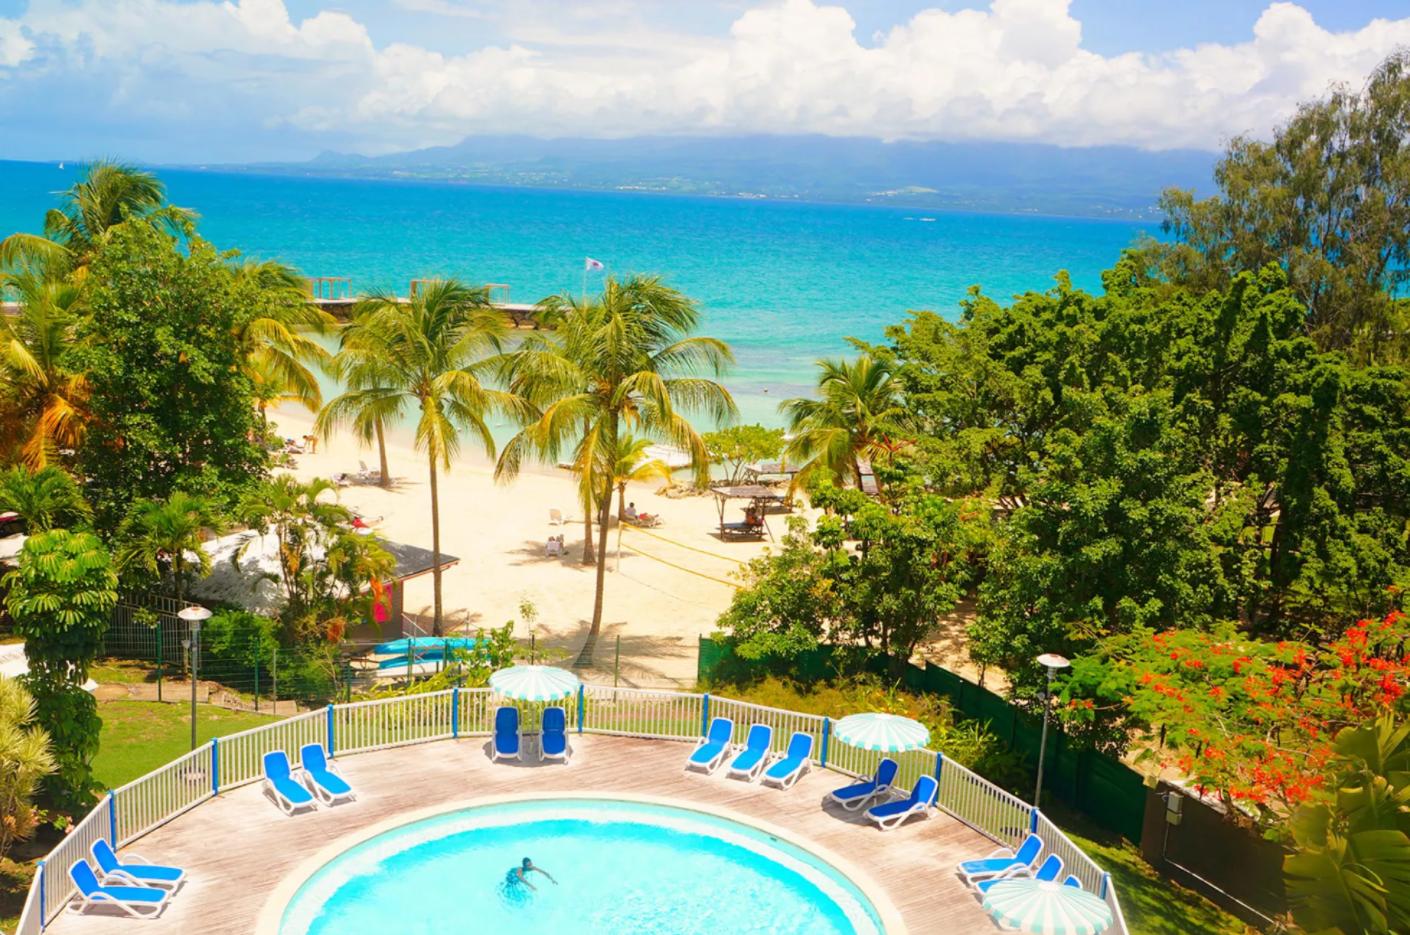 Séjour Guadeloupe - Hôtel Karibea Beach Hotel 3*